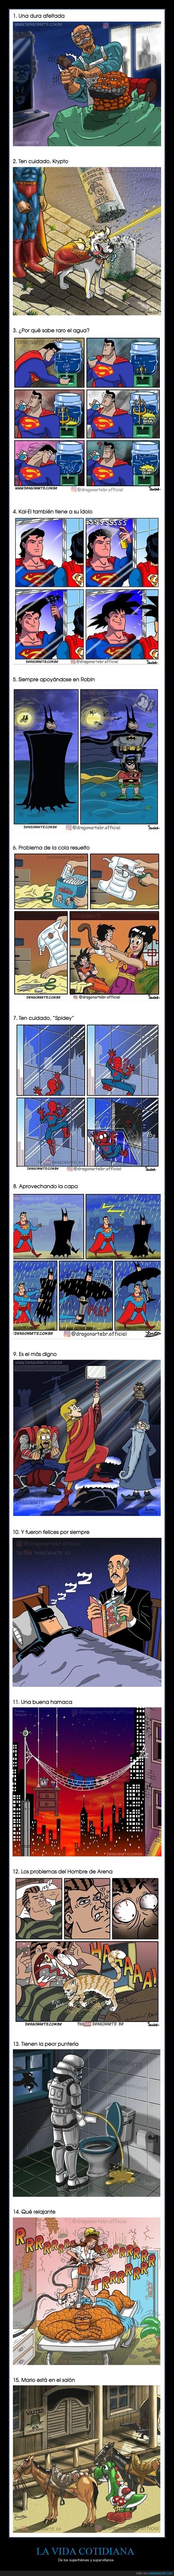 superhéroes,supervillanos,vida cotidiana